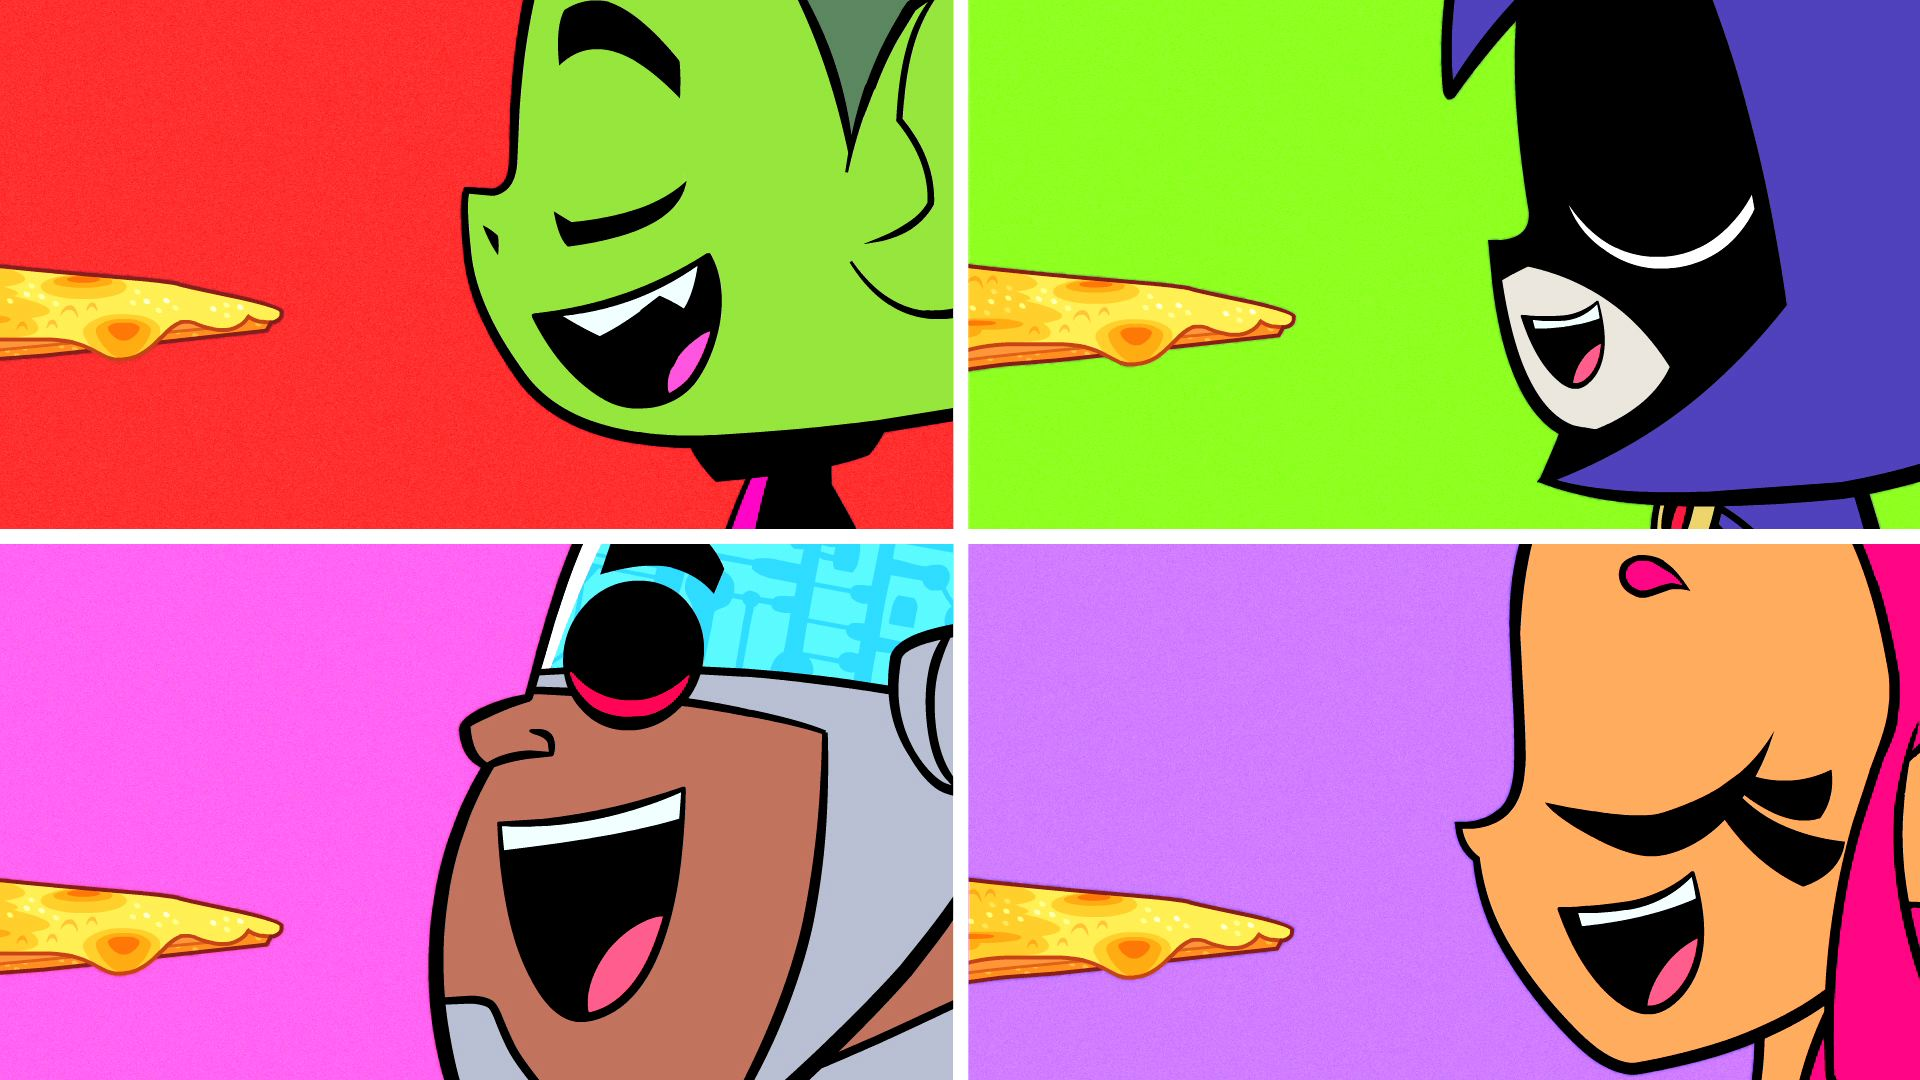 Harley Quinn Power Girl Wallpaper Hd Teen Titans Go Hd Wallpapers Pixelstalk Net